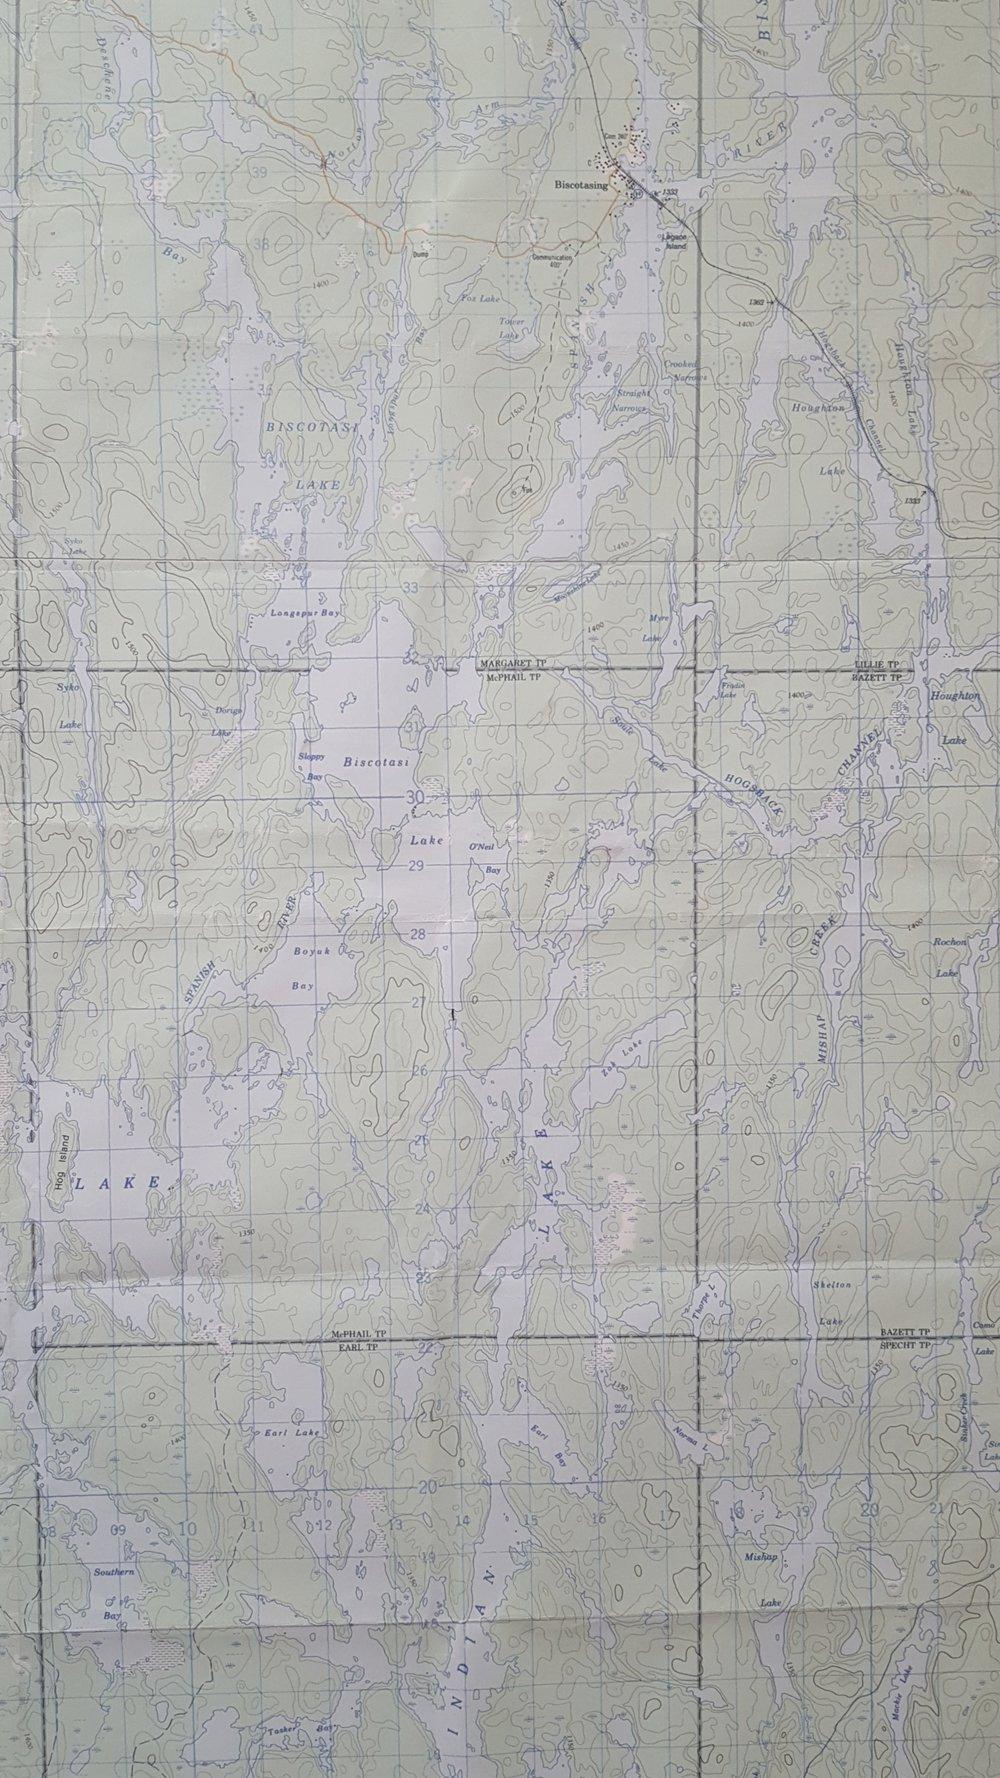 Biscotasing Map